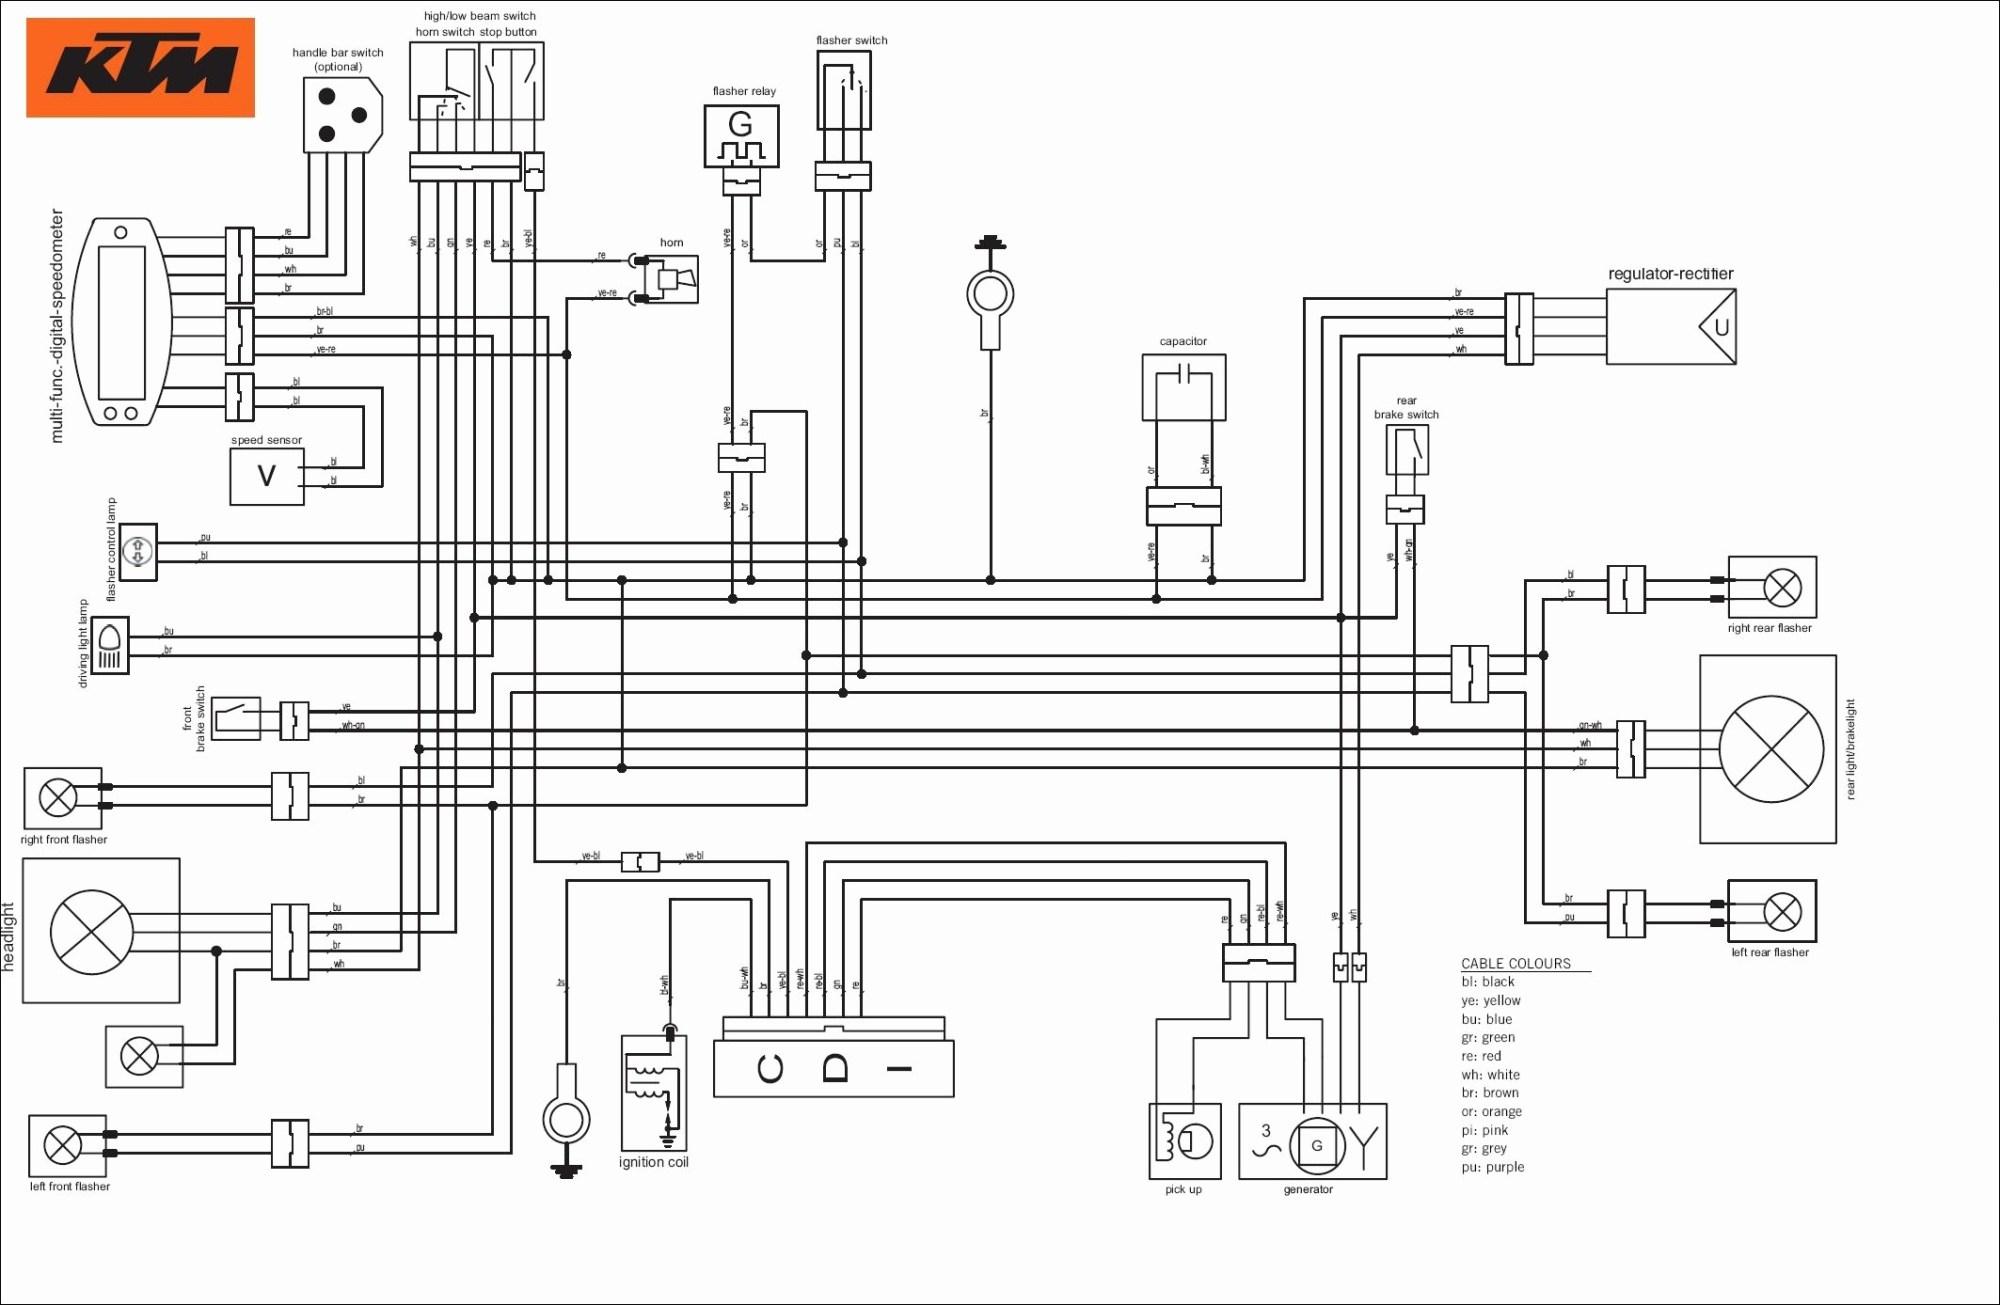 hight resolution of john deere lt133 wiring diagram wiring diagram image s1642 wiring diagram john deere lt133 wiring diagram